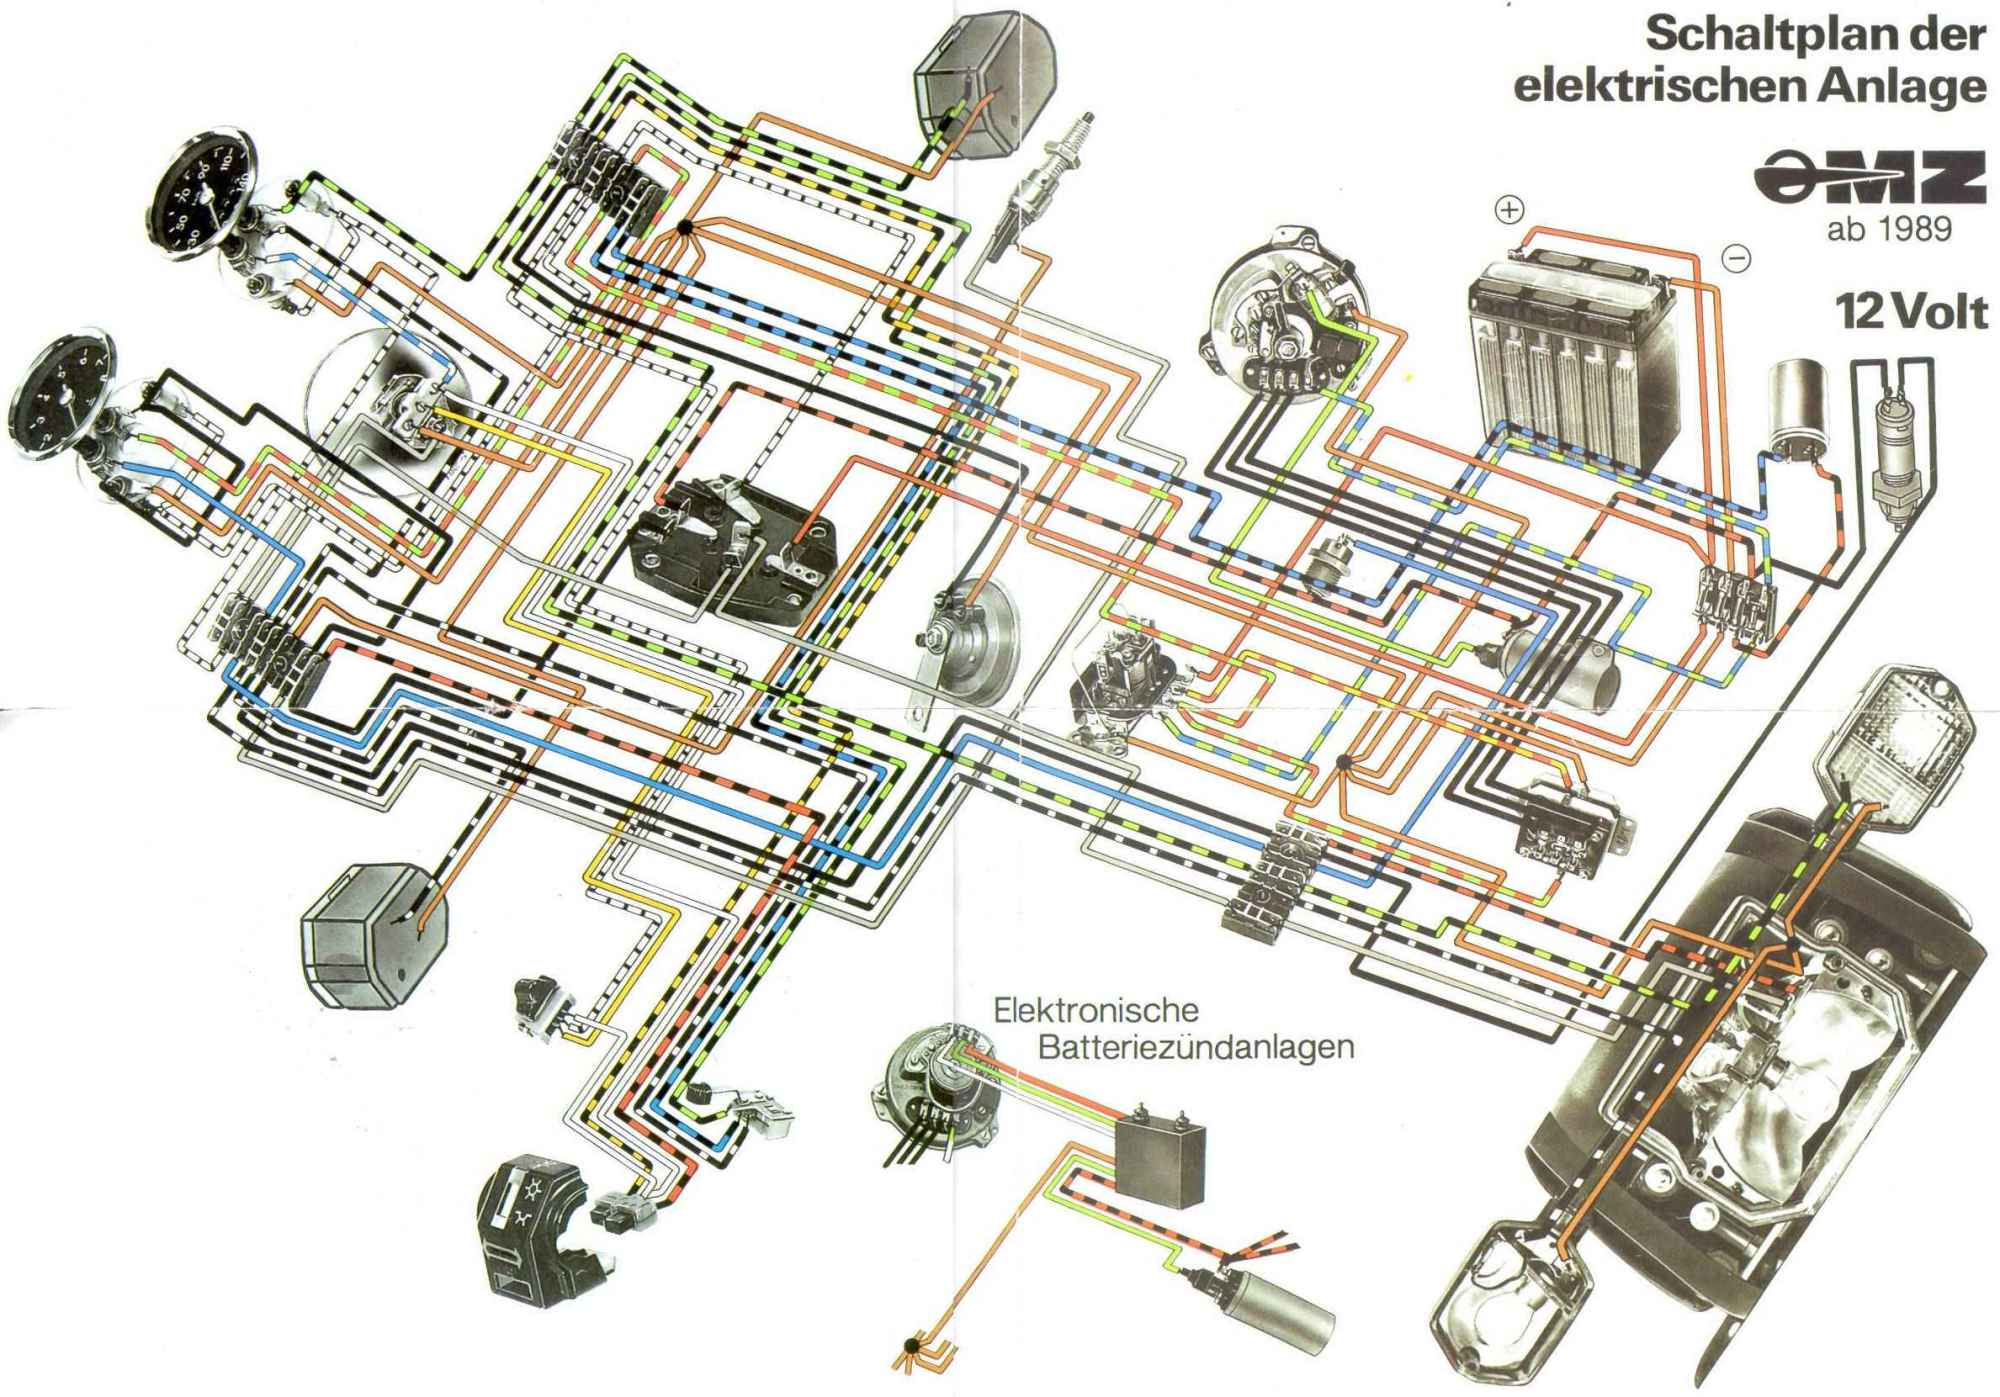 hight resolution of 12v wiring diagram http www mz cx technik elektrik schaltplan 12v l jpg